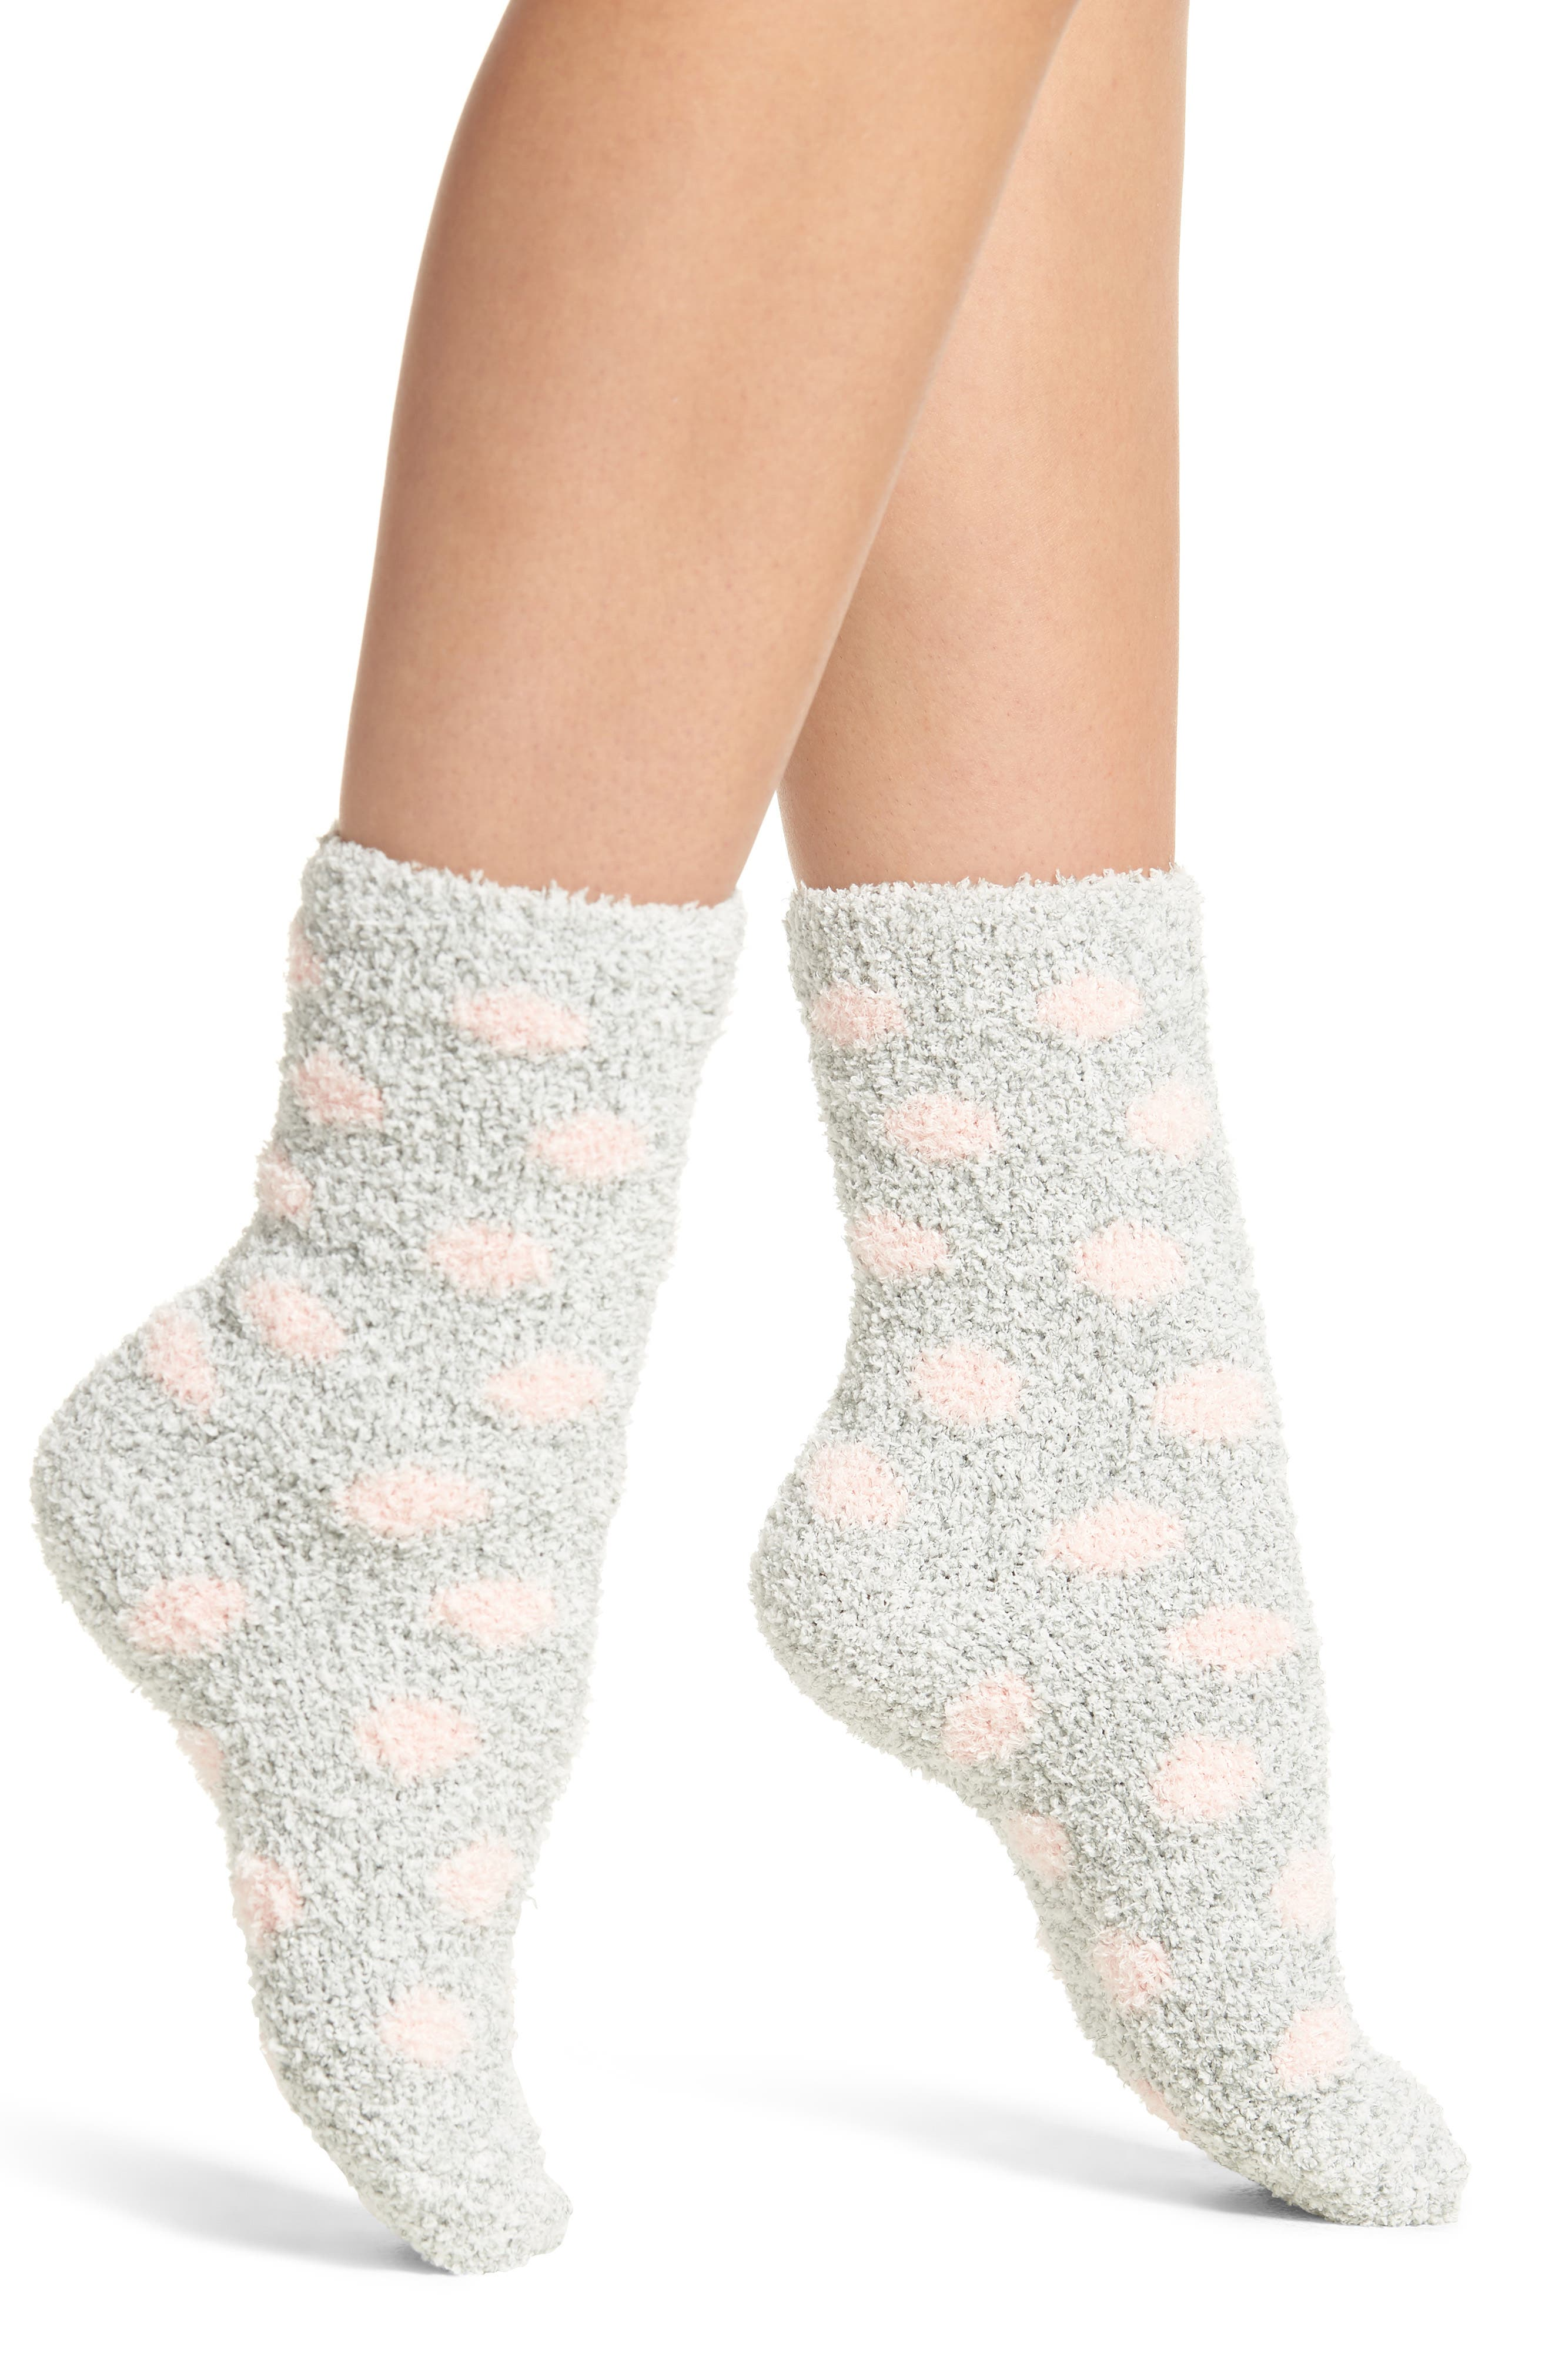 Butter Pattern Crew Socks,                         Main,                         color, GREY W/ LIGHT PINK DOTS